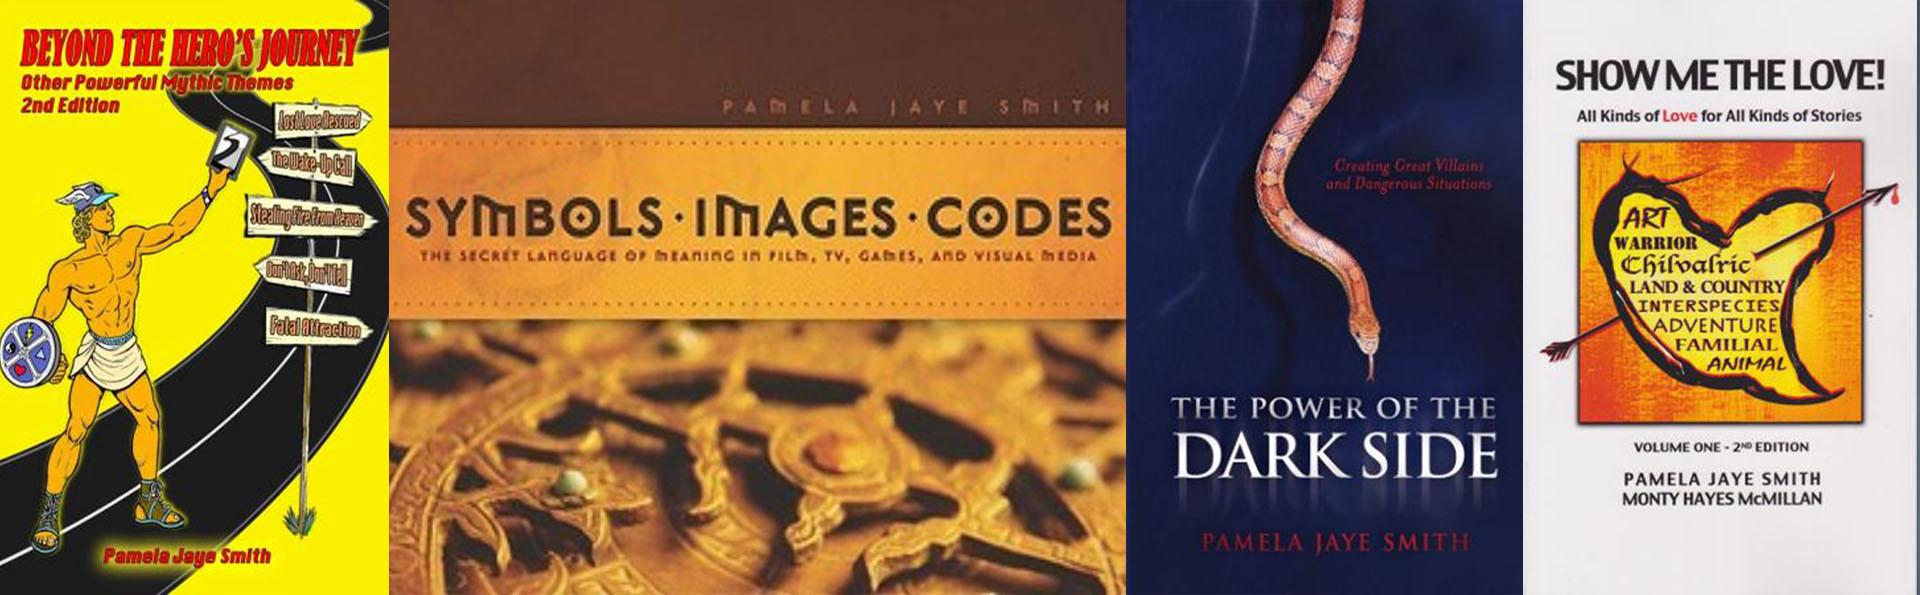 Pamela Jaye Smith Books